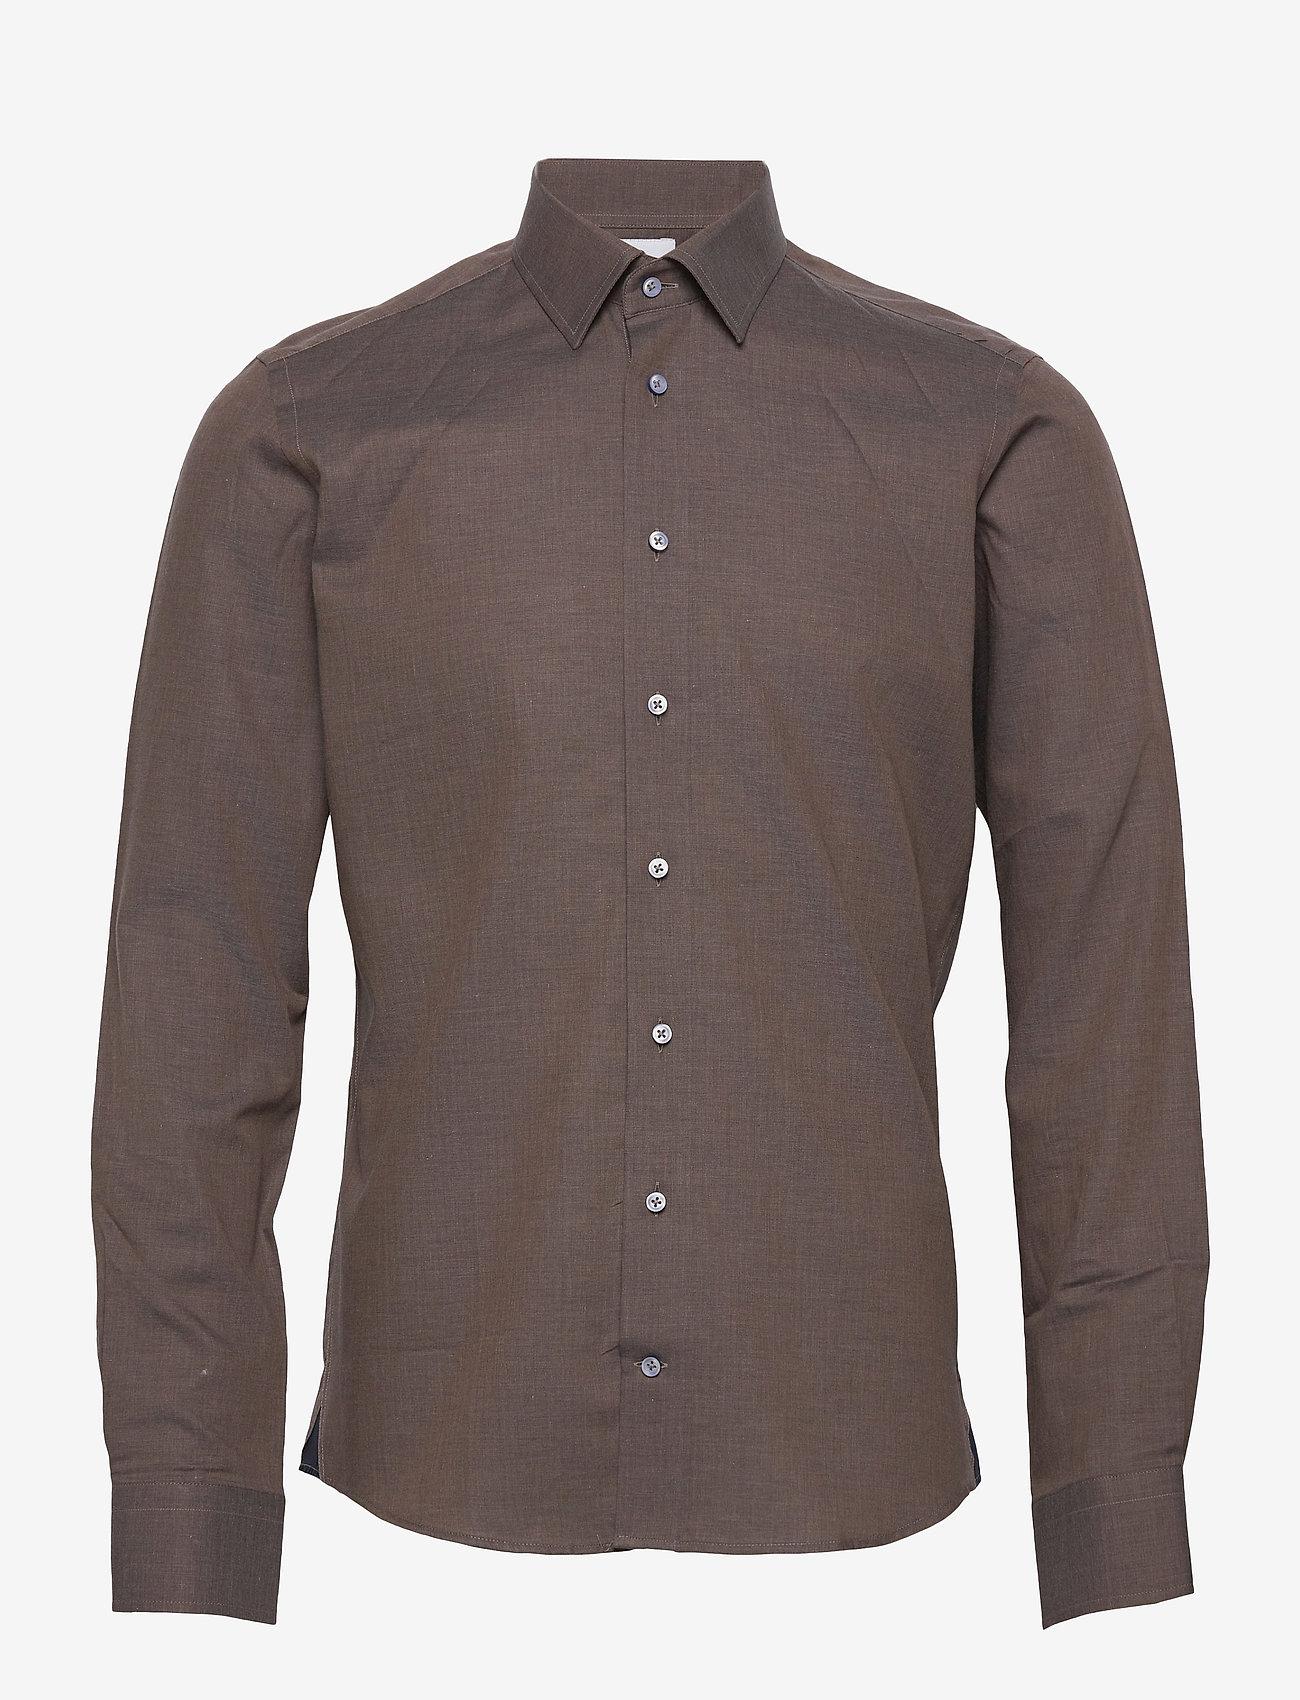 XO Shirtmaker by Sand Copenhagen - 8859 X - Jake SC - basic skjortor - dark brown - 0